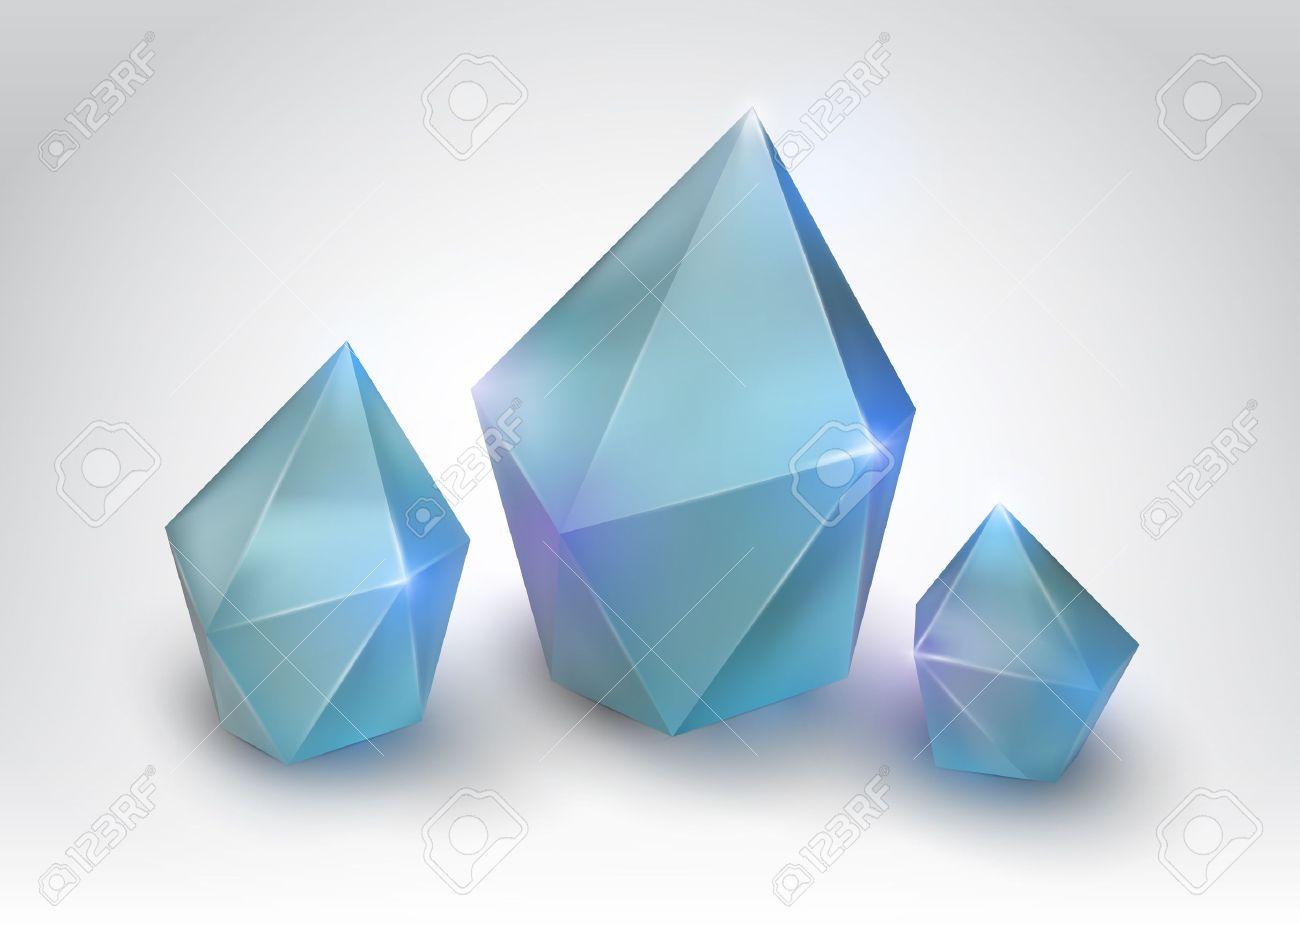 861 Quartz Crystal Stock Vector Illustration And Royalty Free.